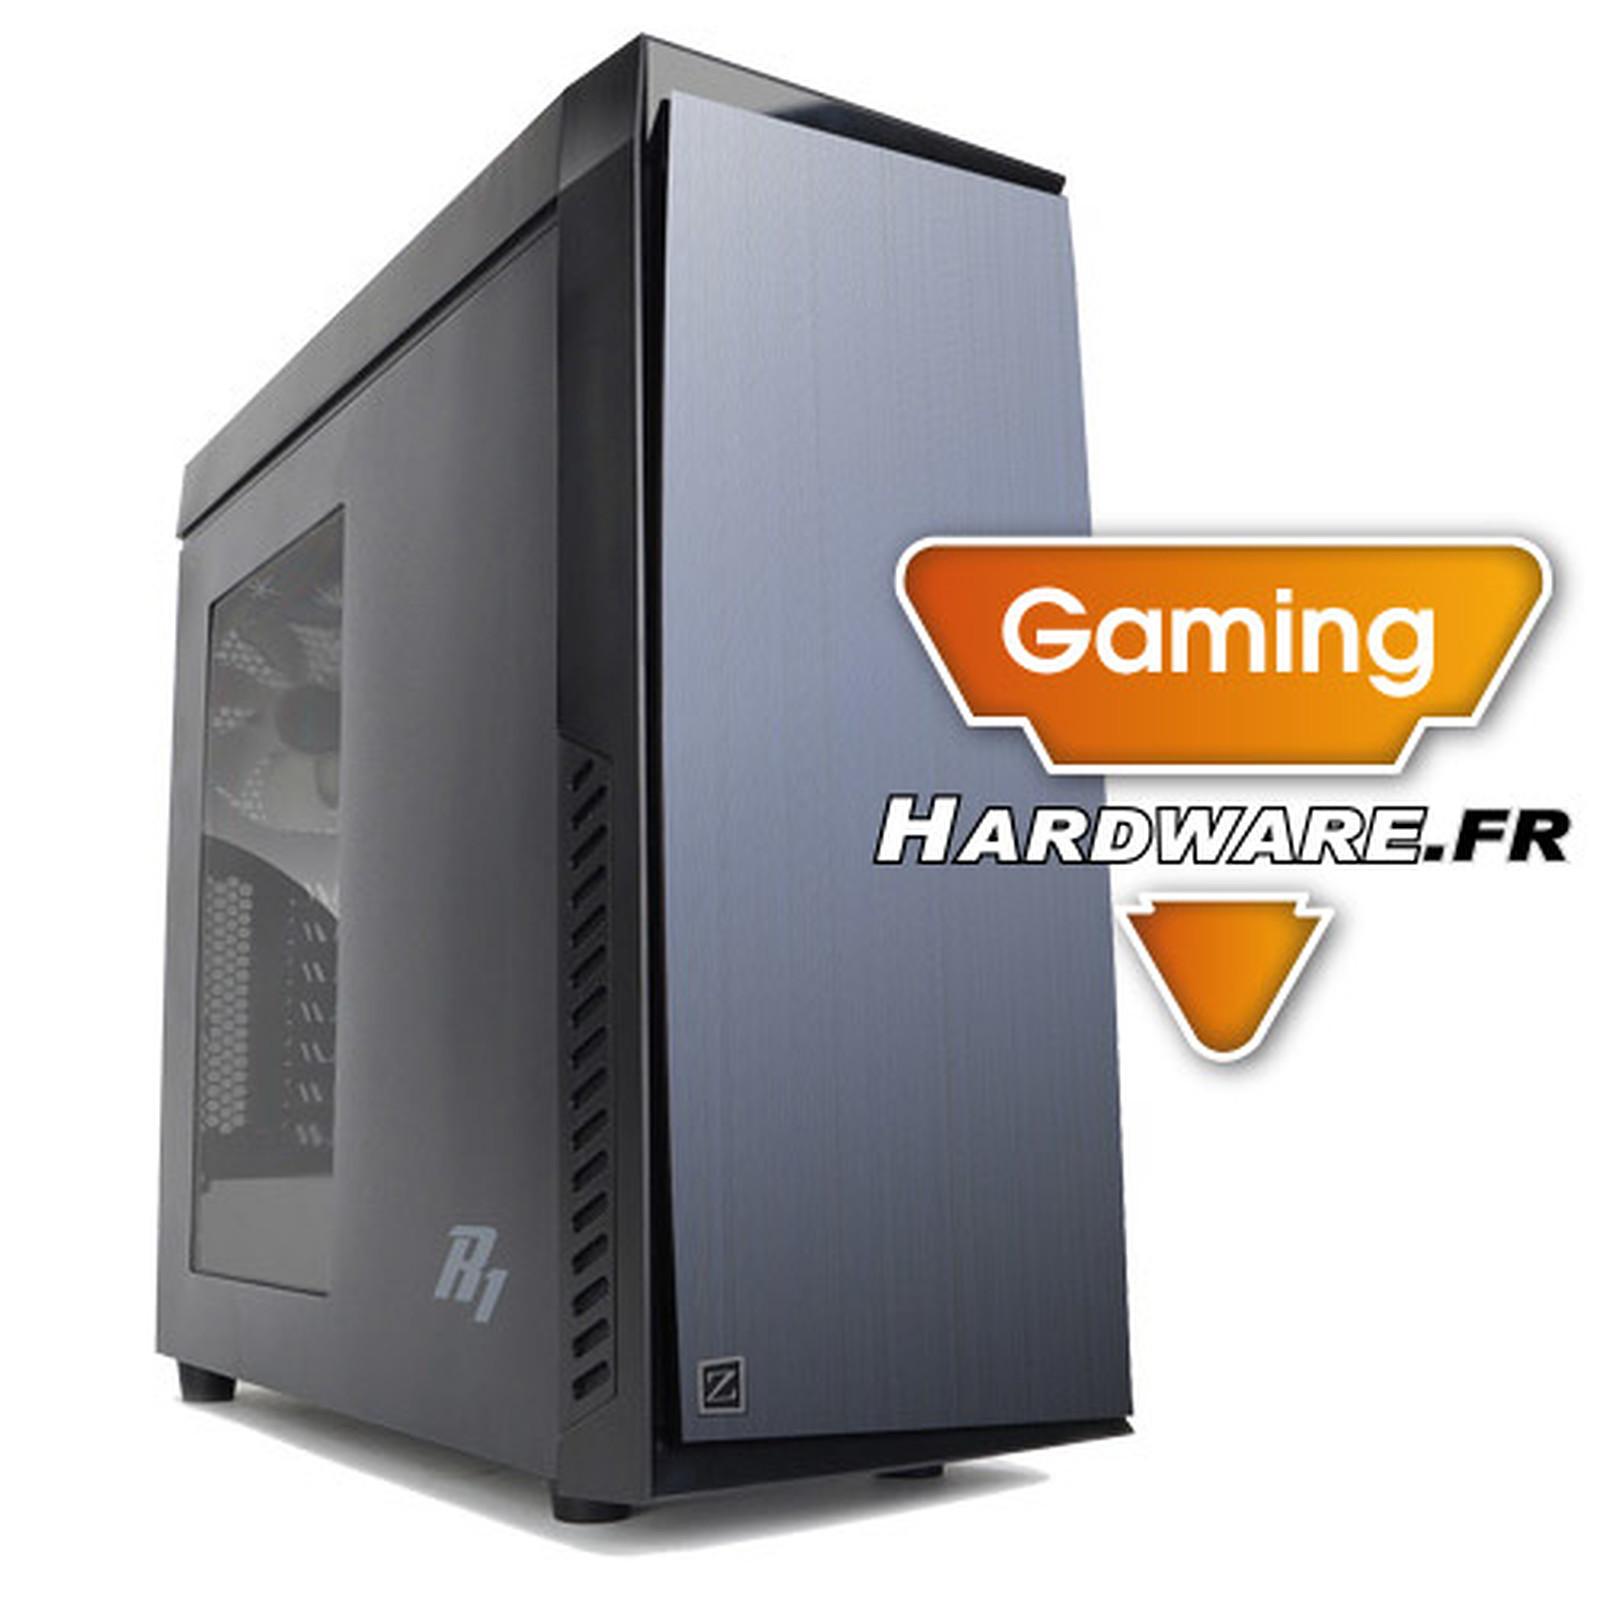 PC HardWare.fr Gaming Plus - Windows 7 Premium 64 bits (monté)